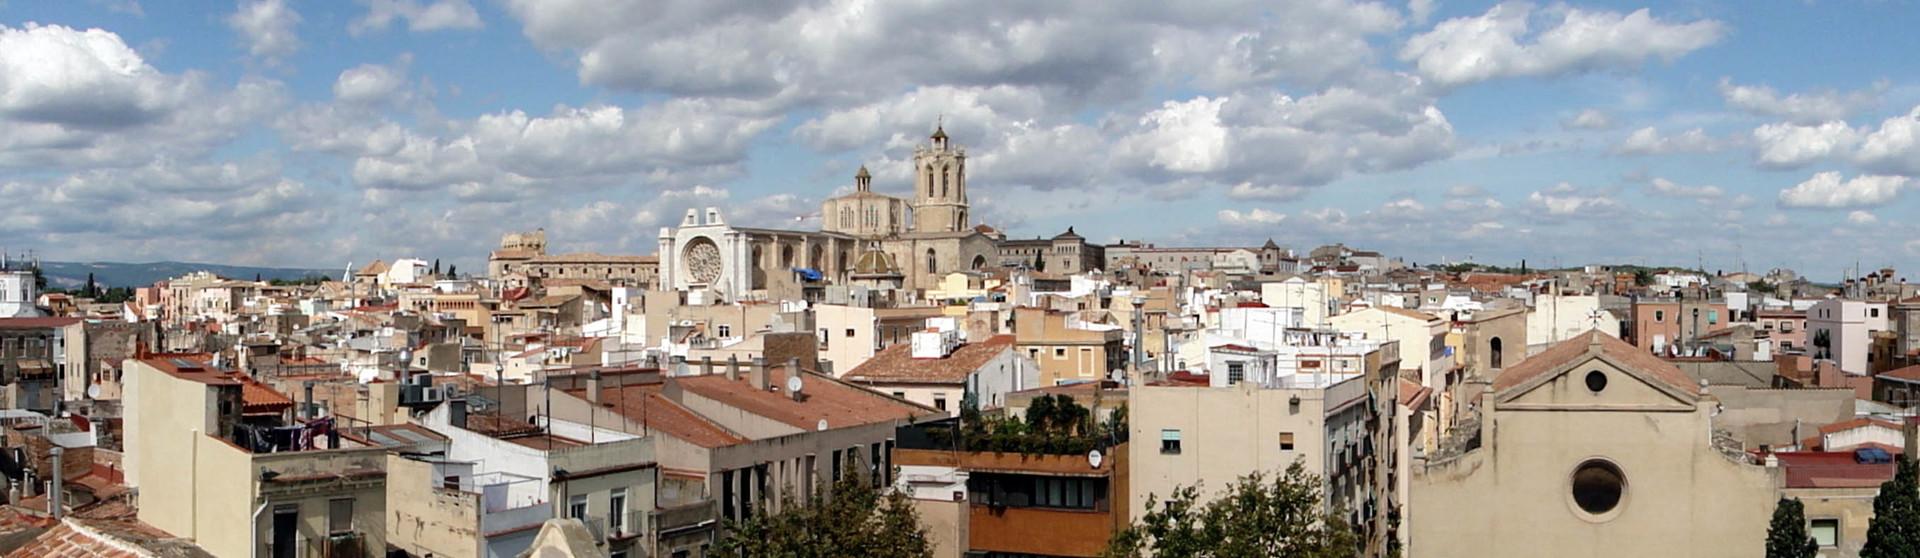 Expérience Erasmus à Tarragone, Espagne